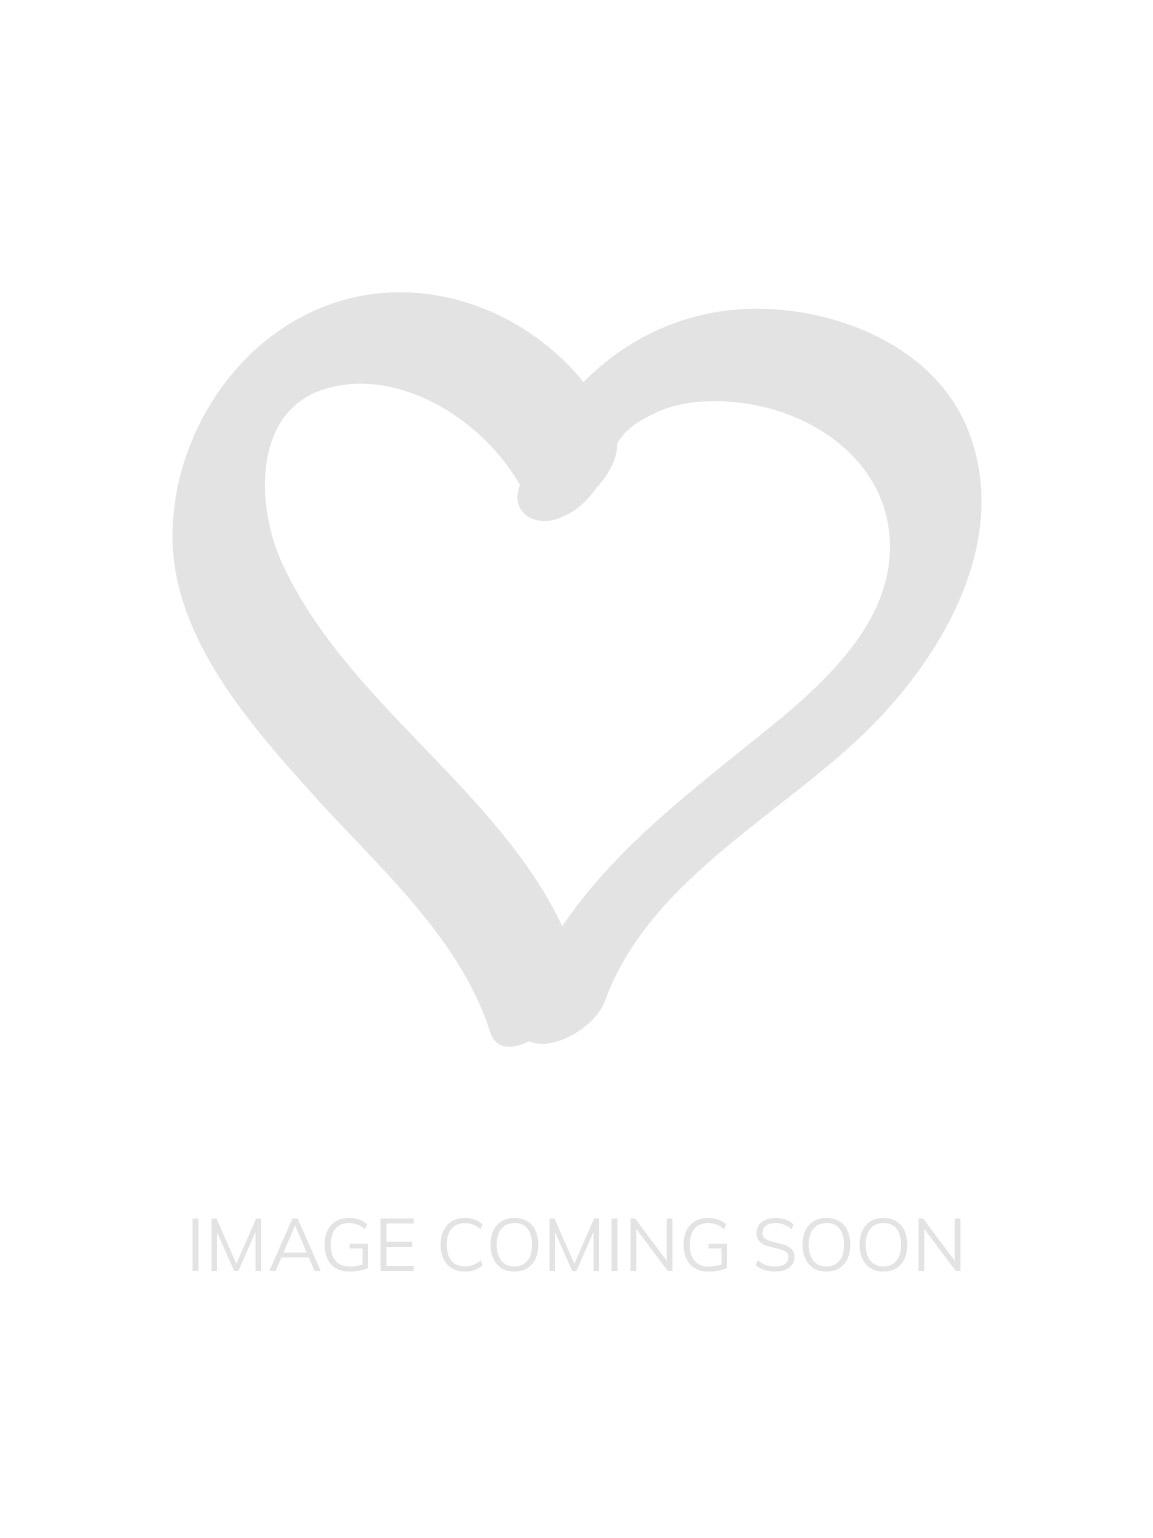 ca1fc7b853f21 Freya Soiree Lace Bralette - Rouge